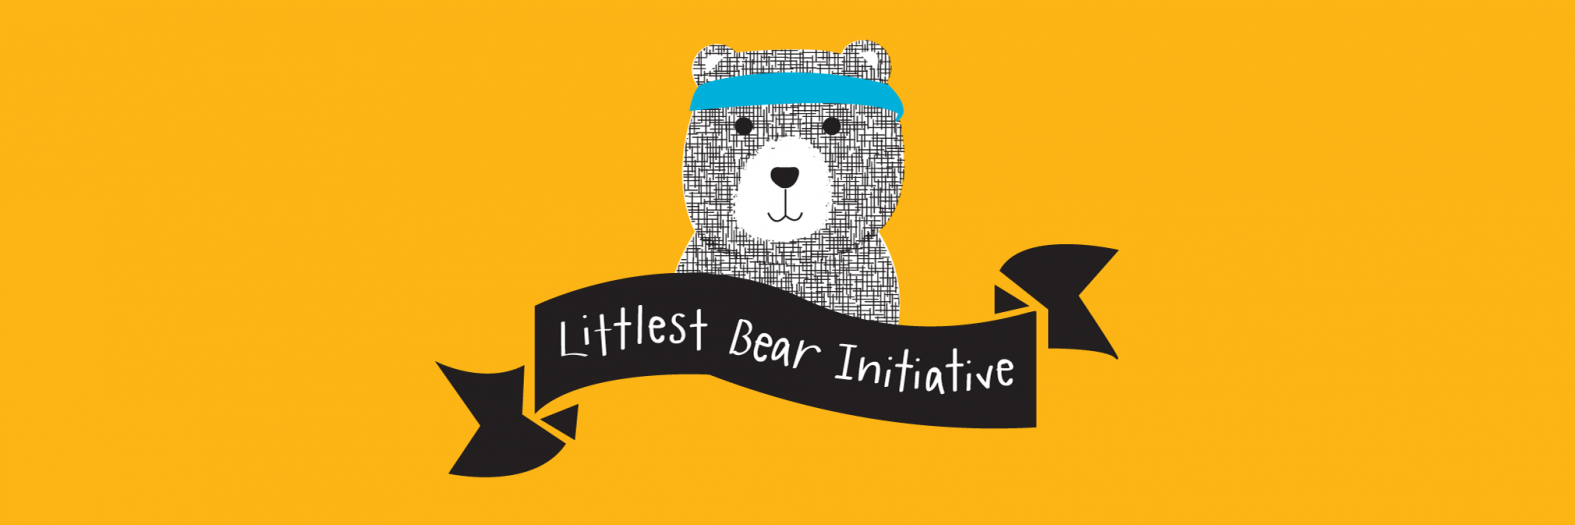 Littlest Bear Initiative